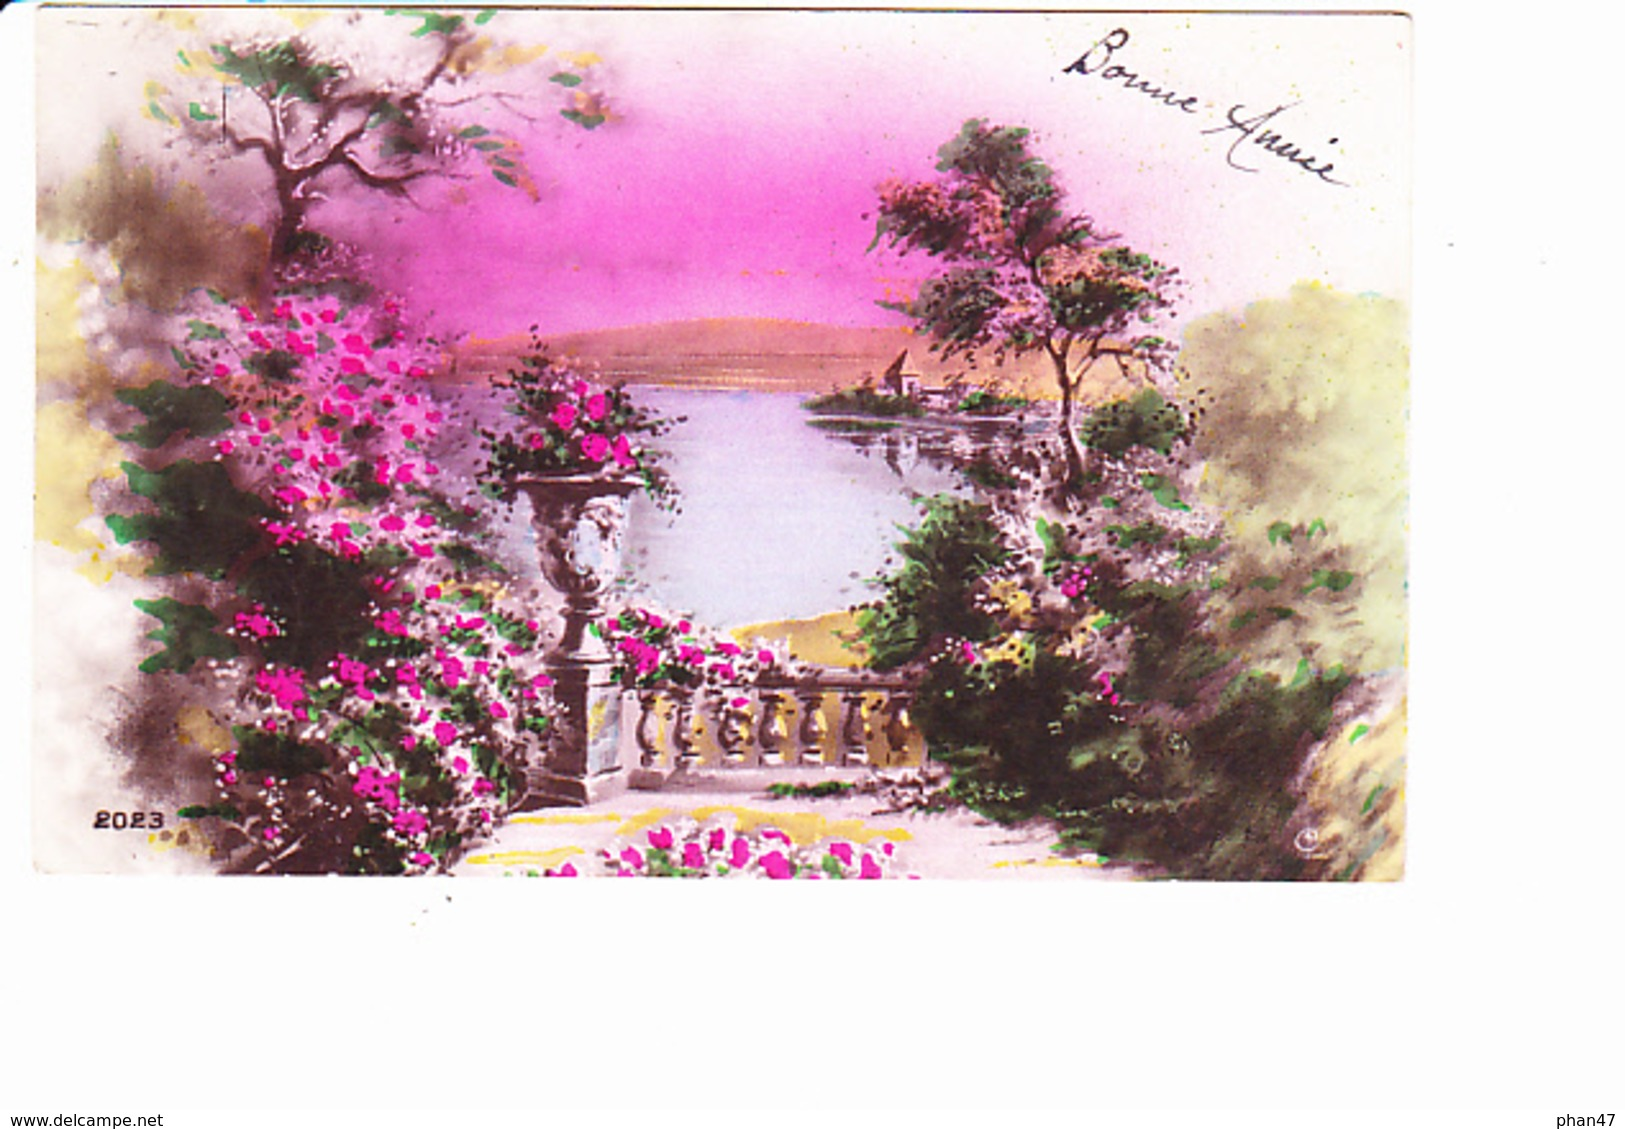 BONNE ANNEE, Paysage De Lac, Balustrade, Ed. Rip 1932 - Nouvel An